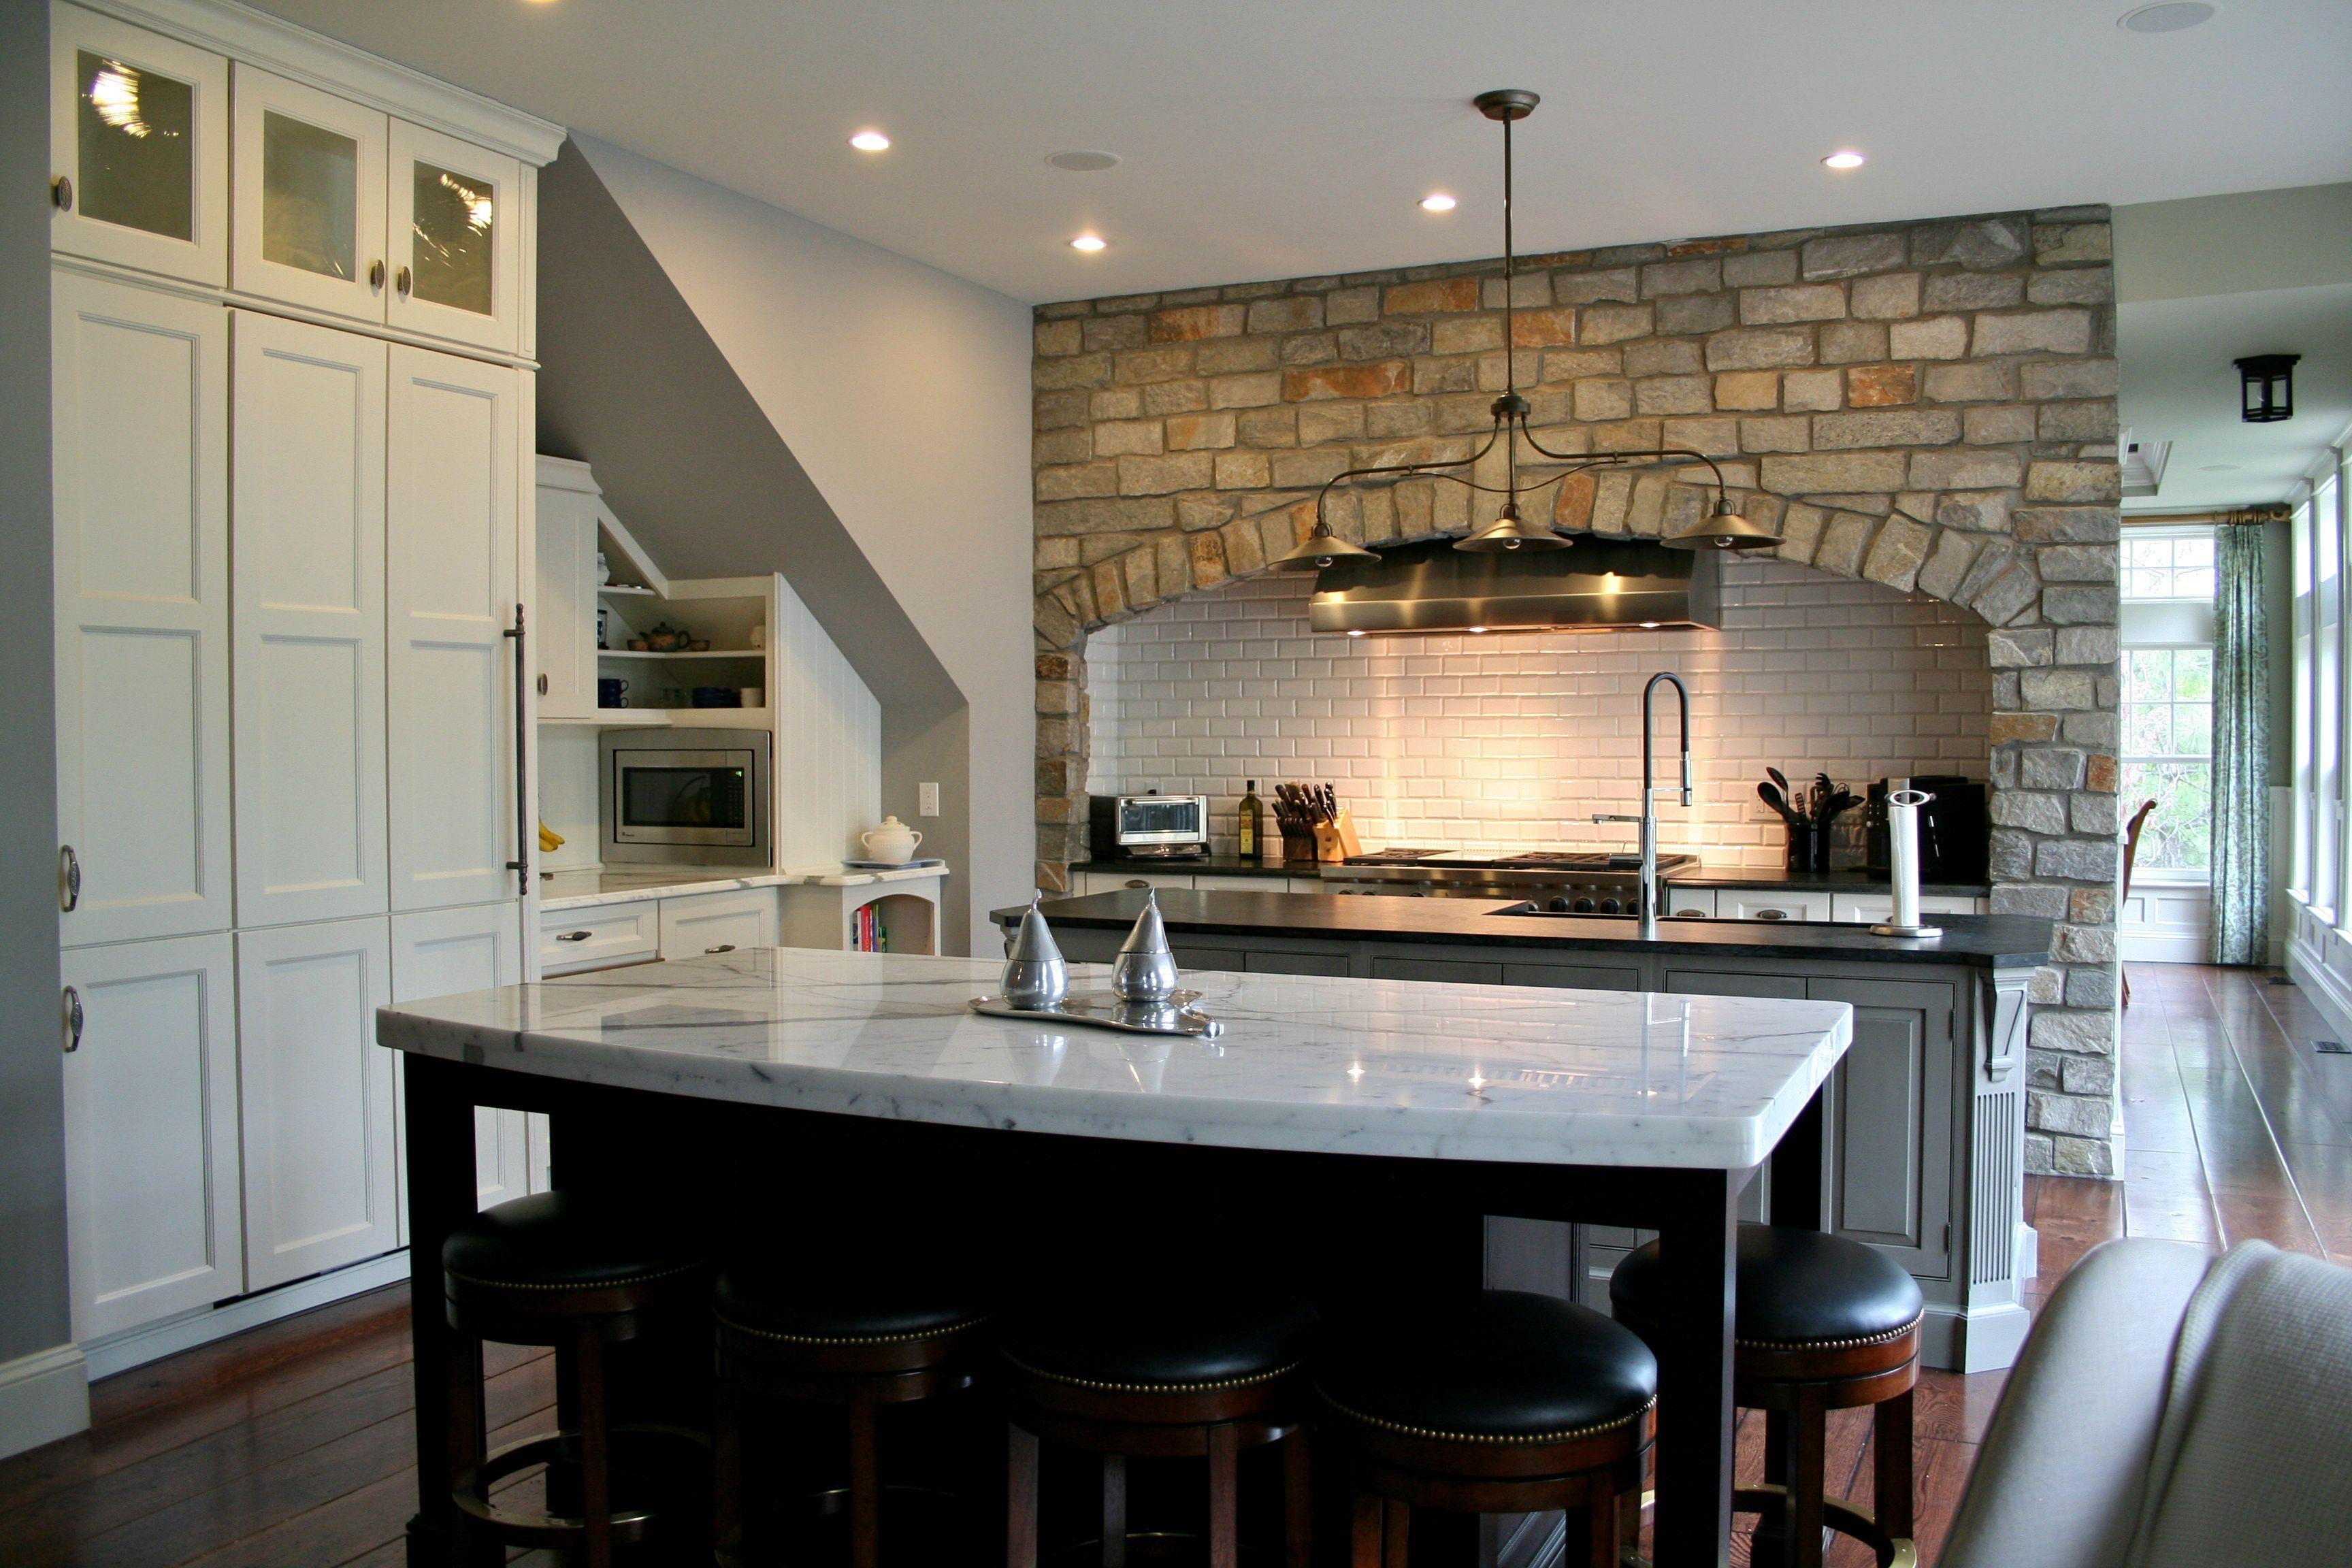 BKC Kitchen and Bath project Perimeter cabinets Medallion